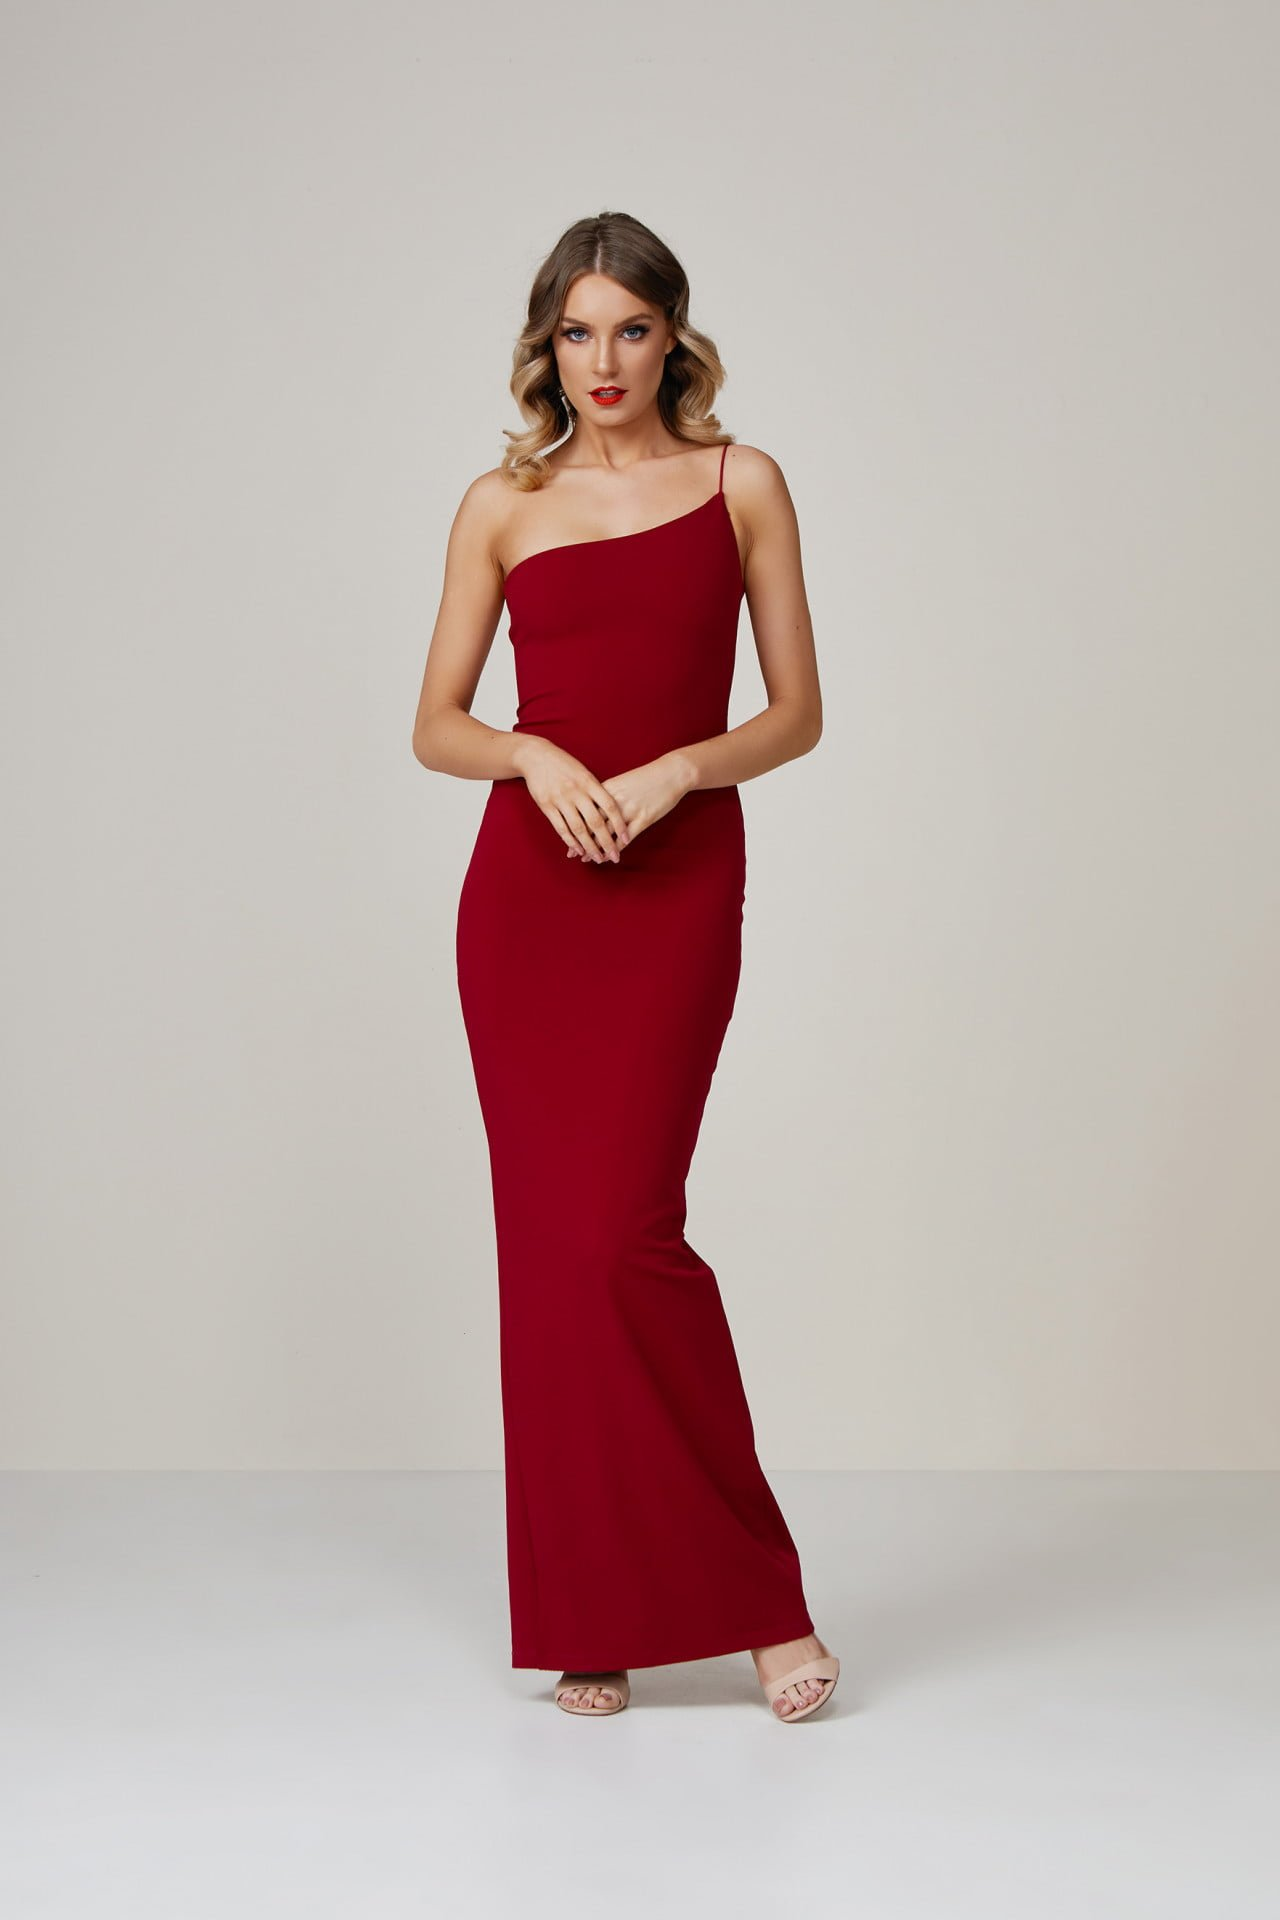 Nookie Penelope Gown Floor Length, Maxi, Off-Shoulder Ruby